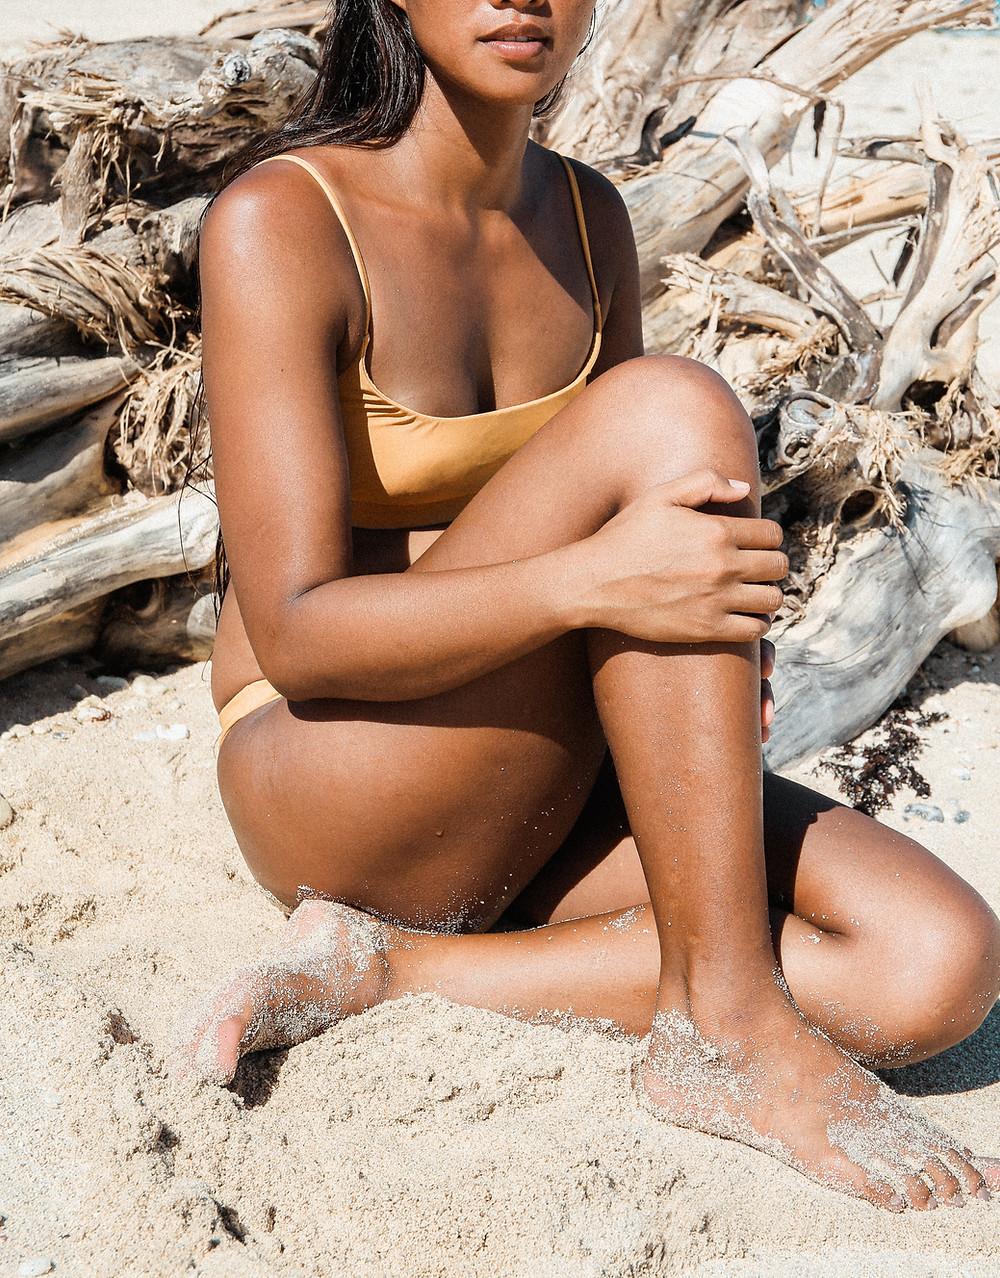 swimwear manufacturers uk bikinis